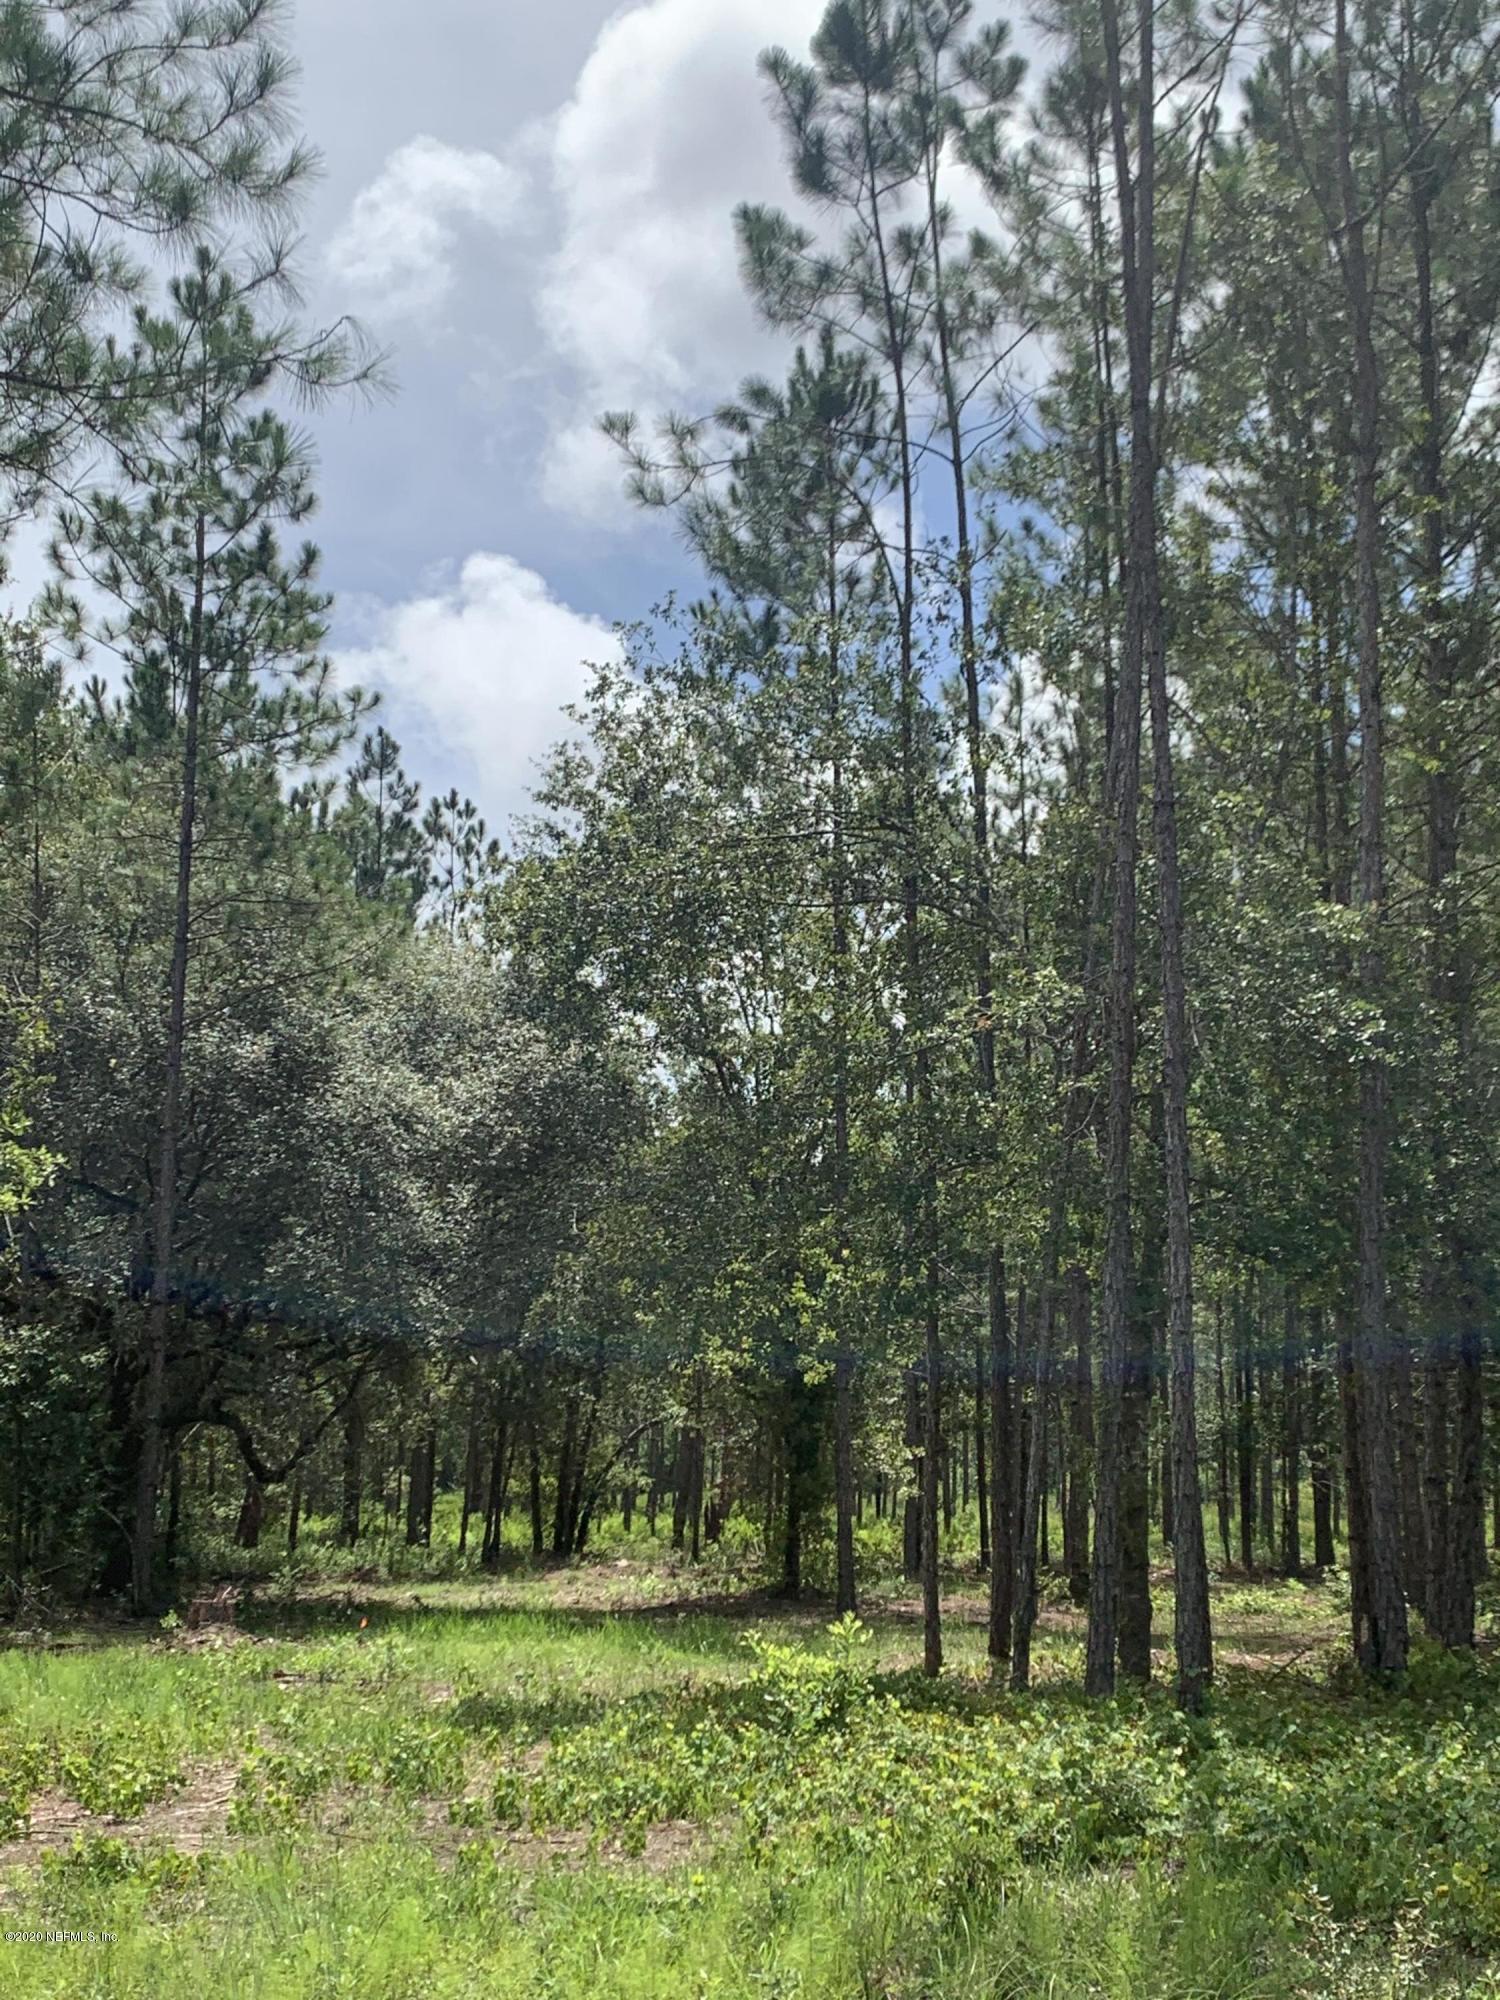 0 (LOT11) 80TH, HAMPTON, FLORIDA 32044, ,Vacant land,For sale,80TH,1011490